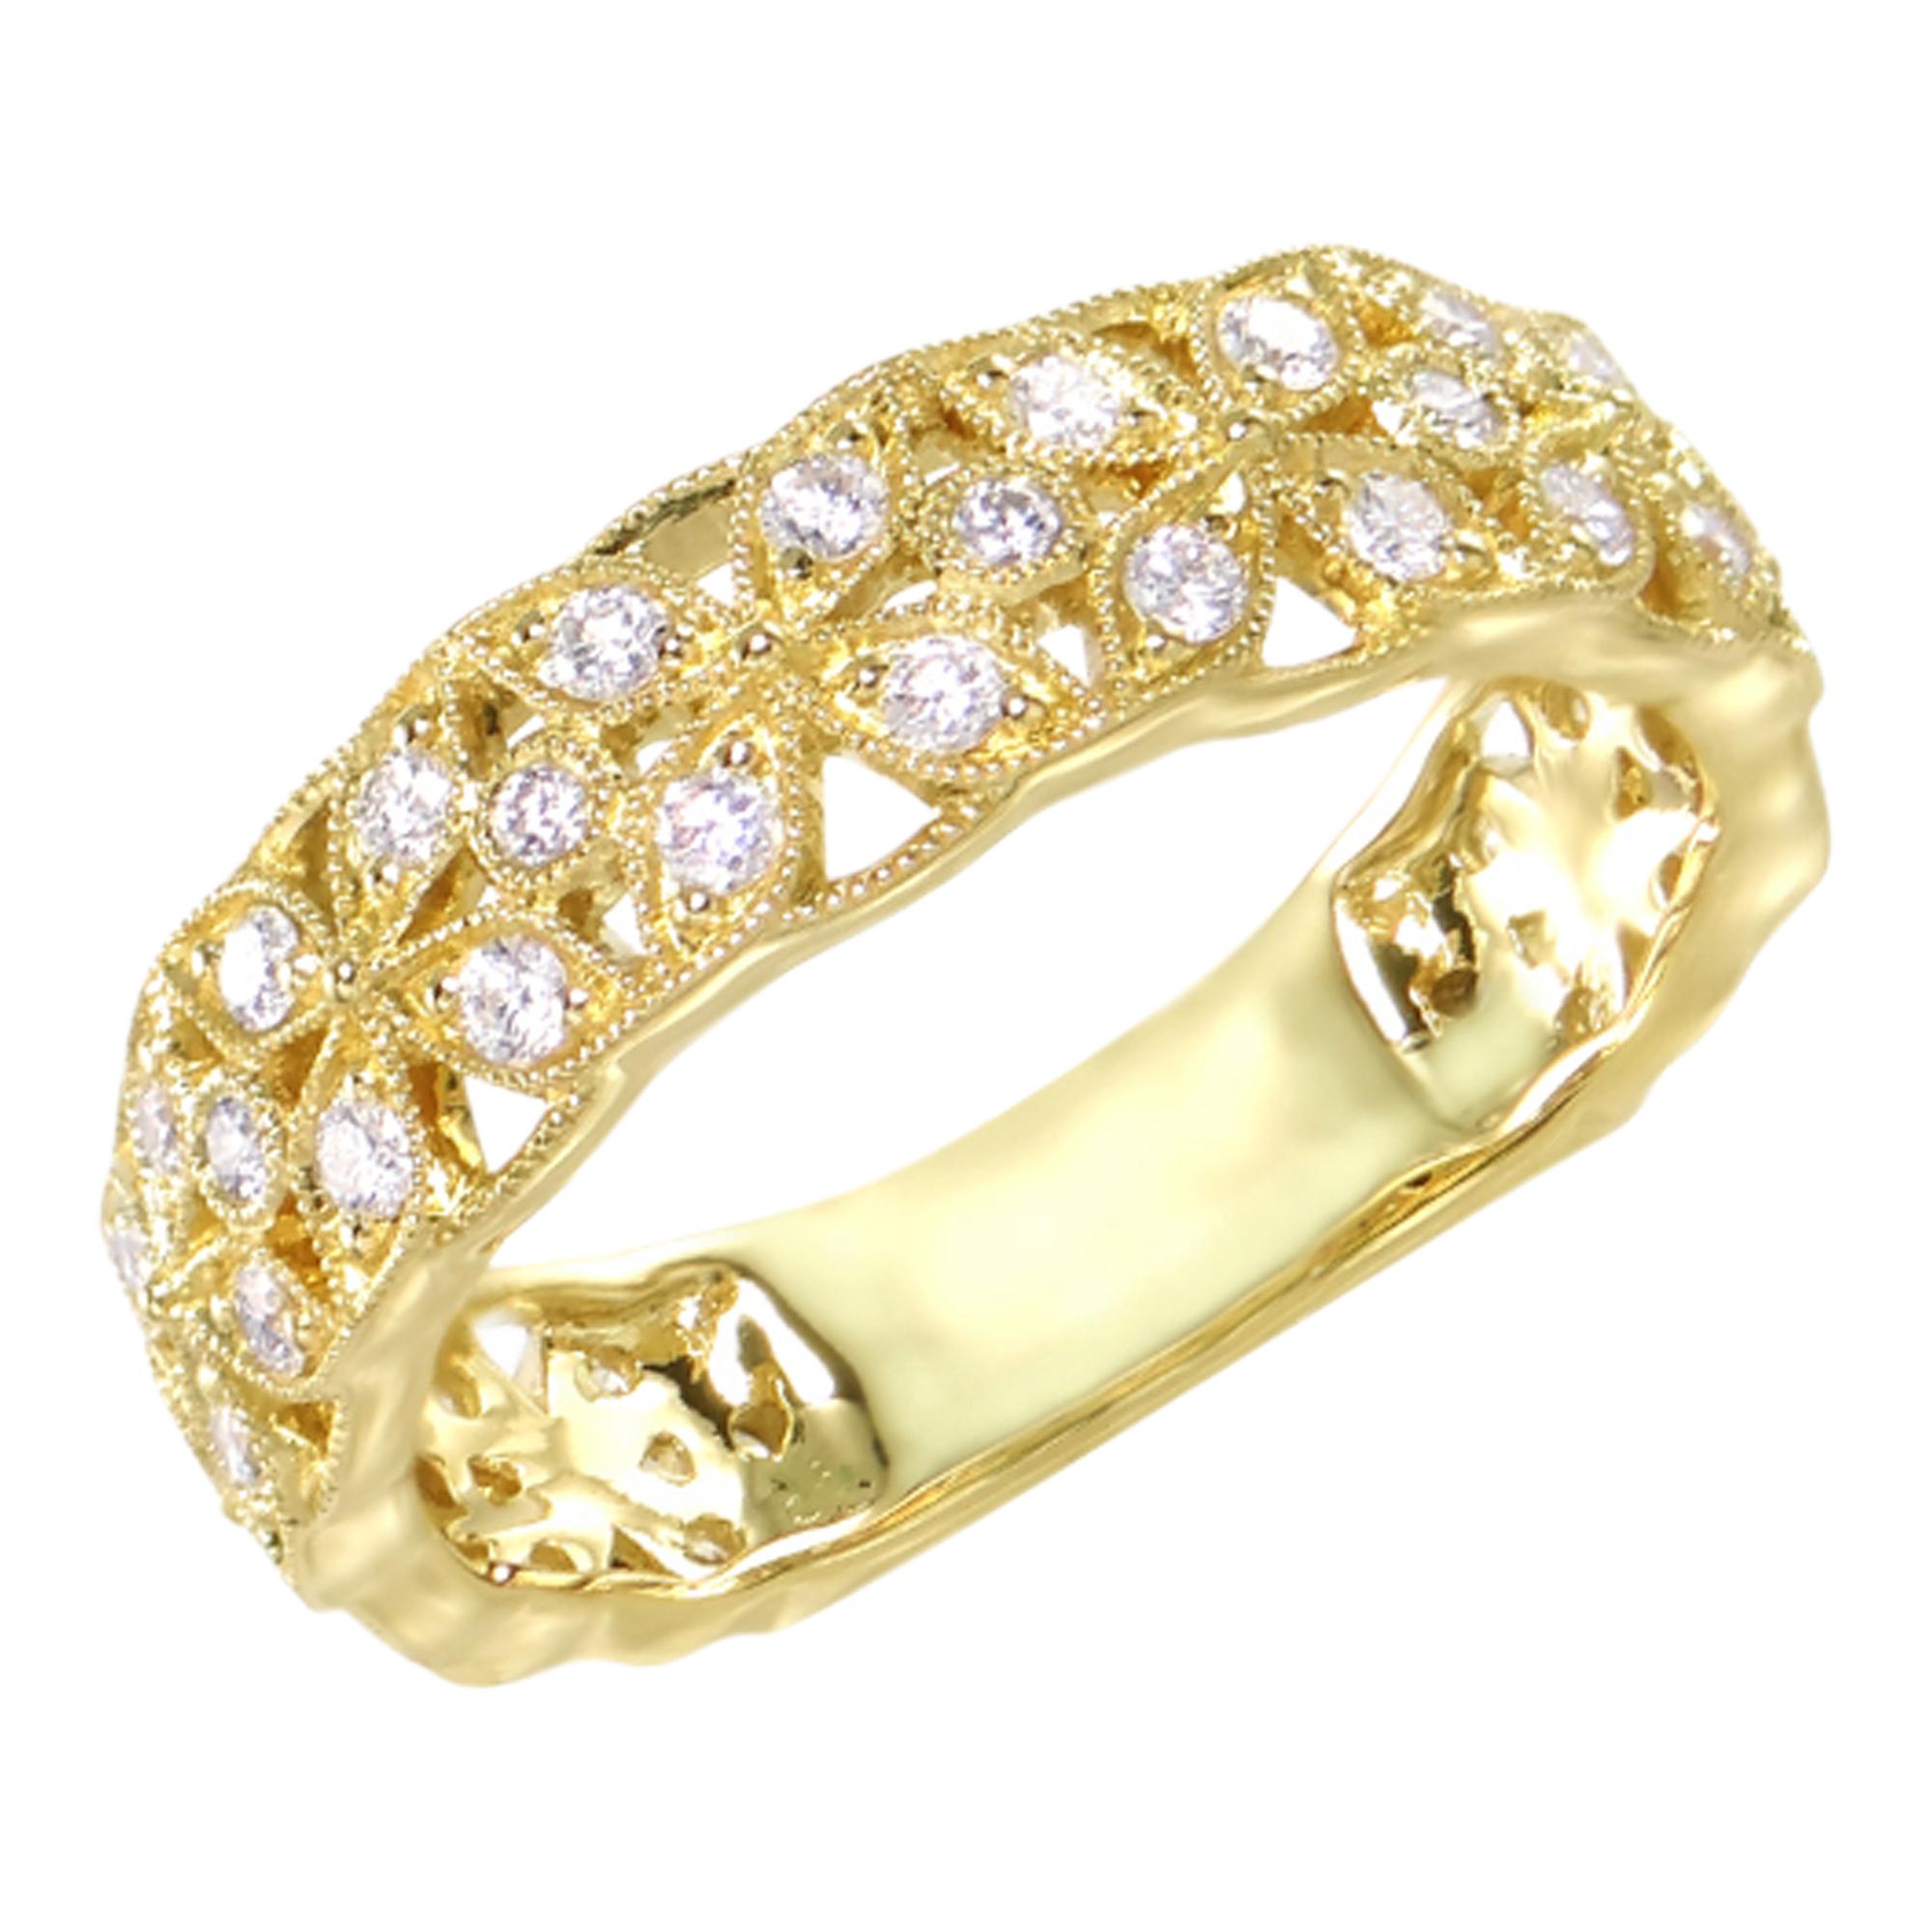 18ct Yellow Gold 3/4 Eterninity Diamond Cross Ring (Copy)